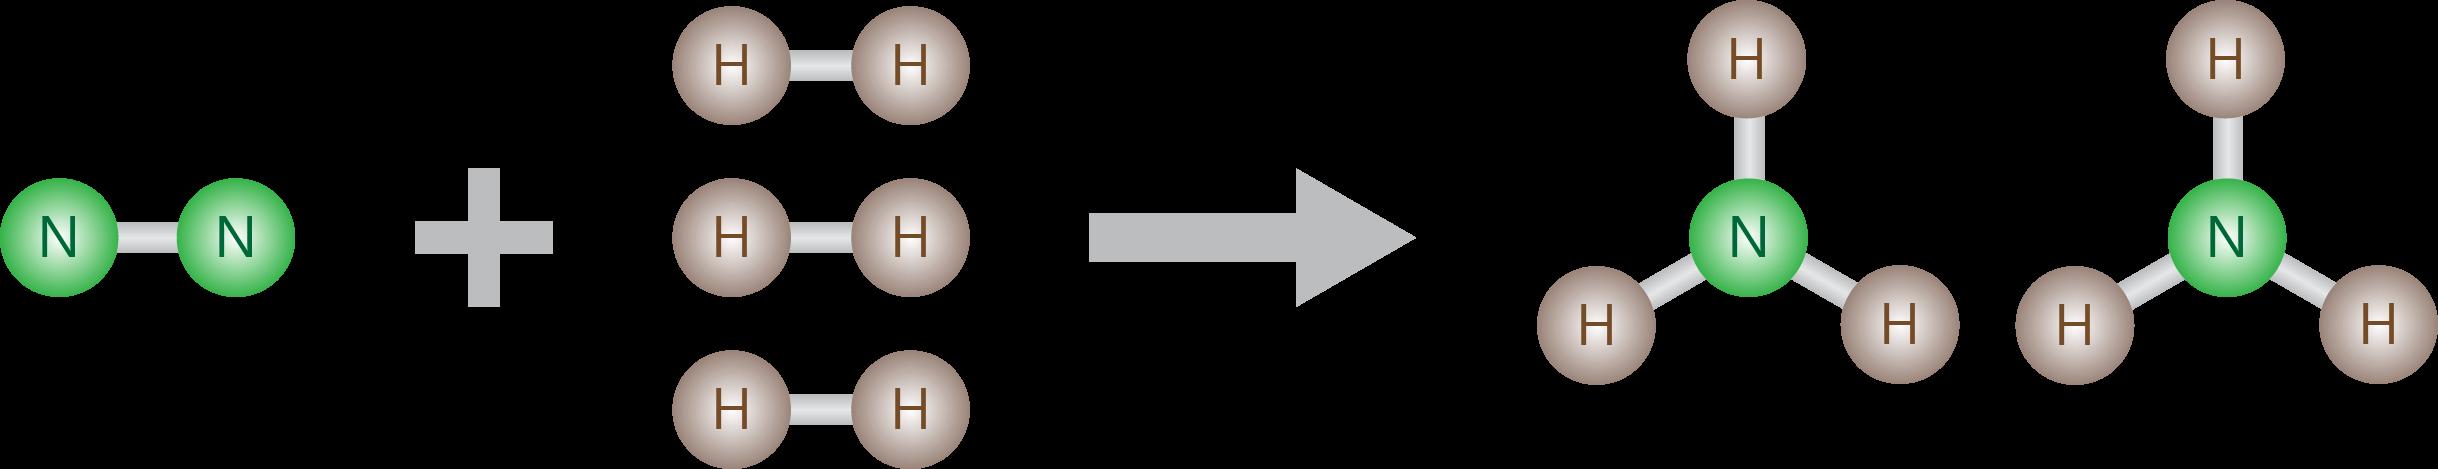 writing balanced chemical equations diagram